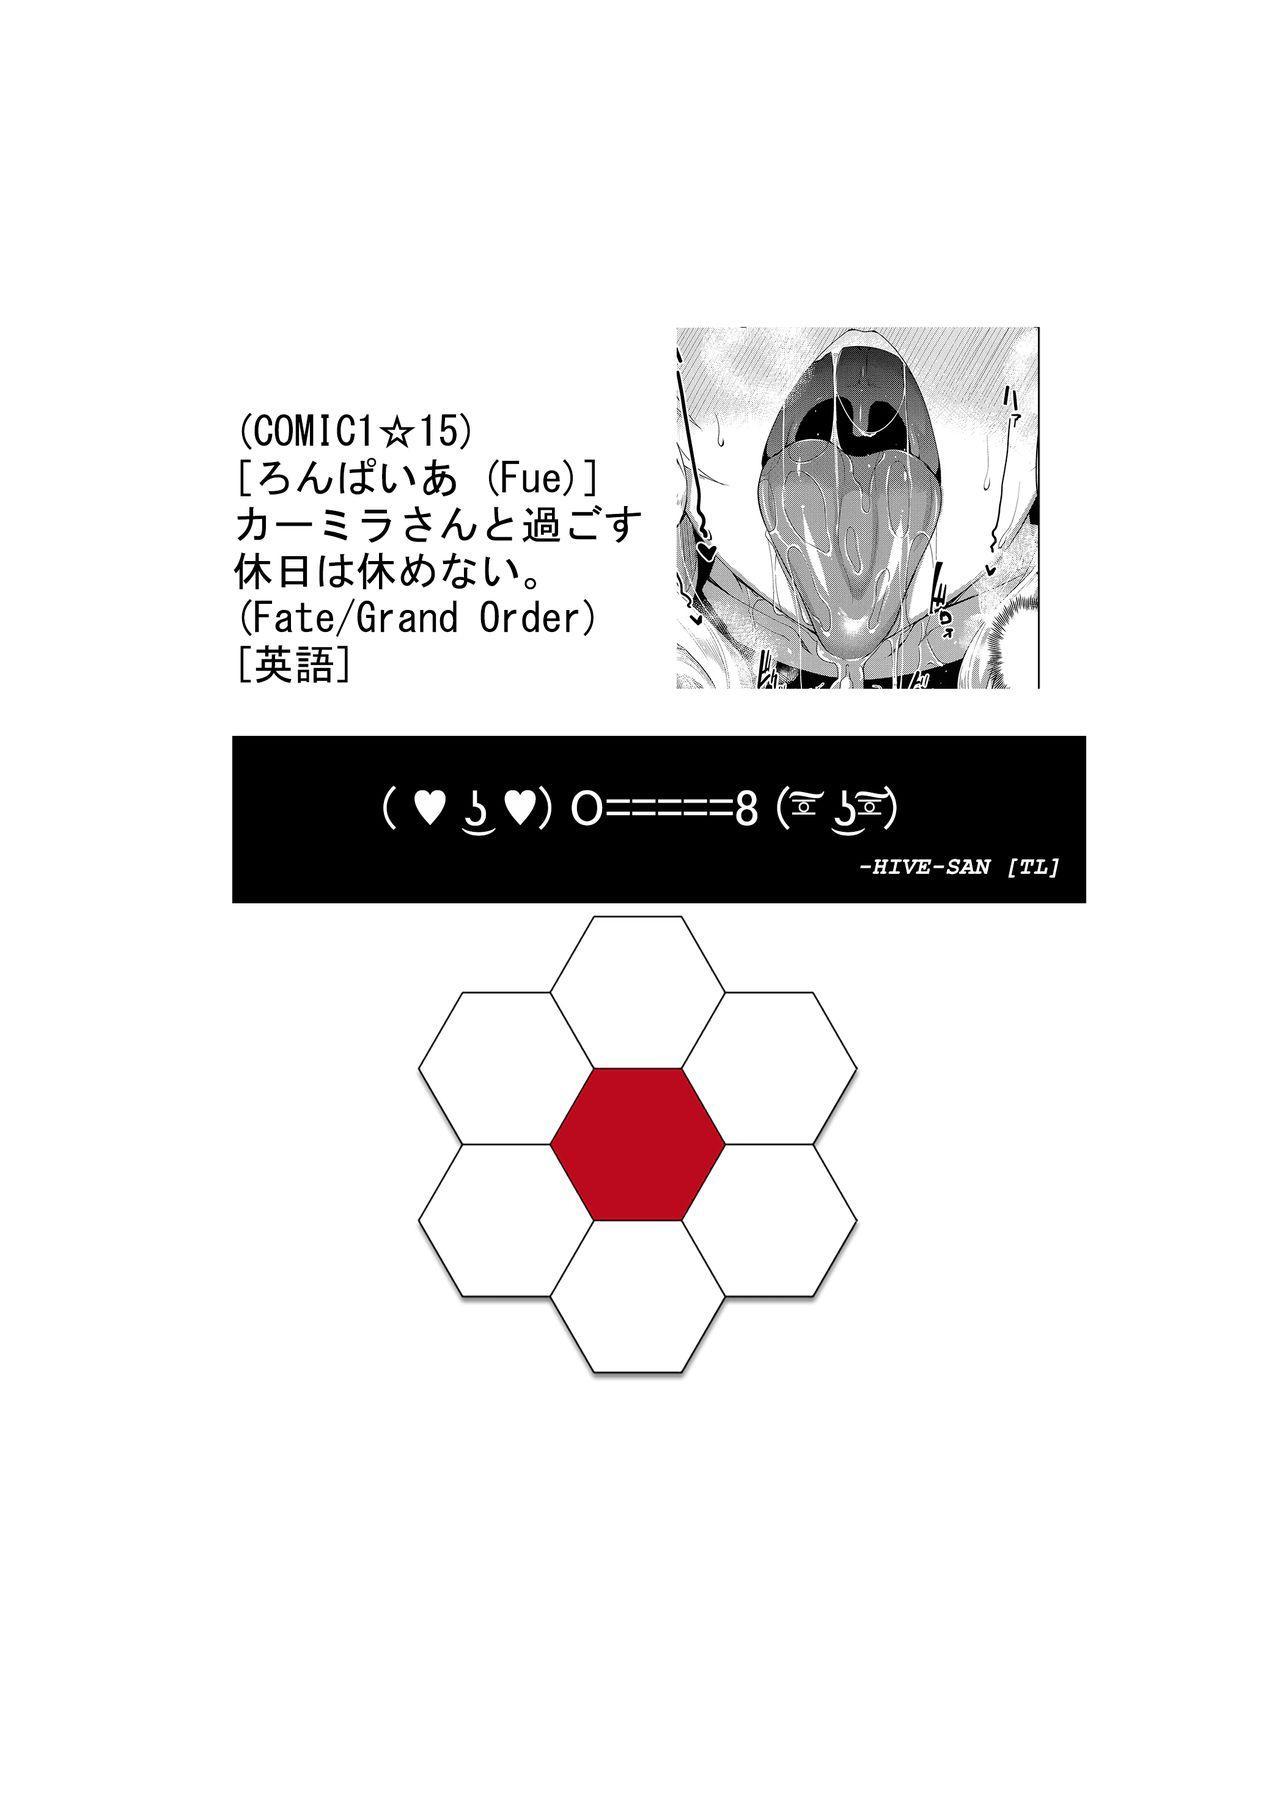 Carmilla-san to Sugosu Kyuujitsu wa Yasumenai. | No Rest On A Day Off With Carmilla. 24